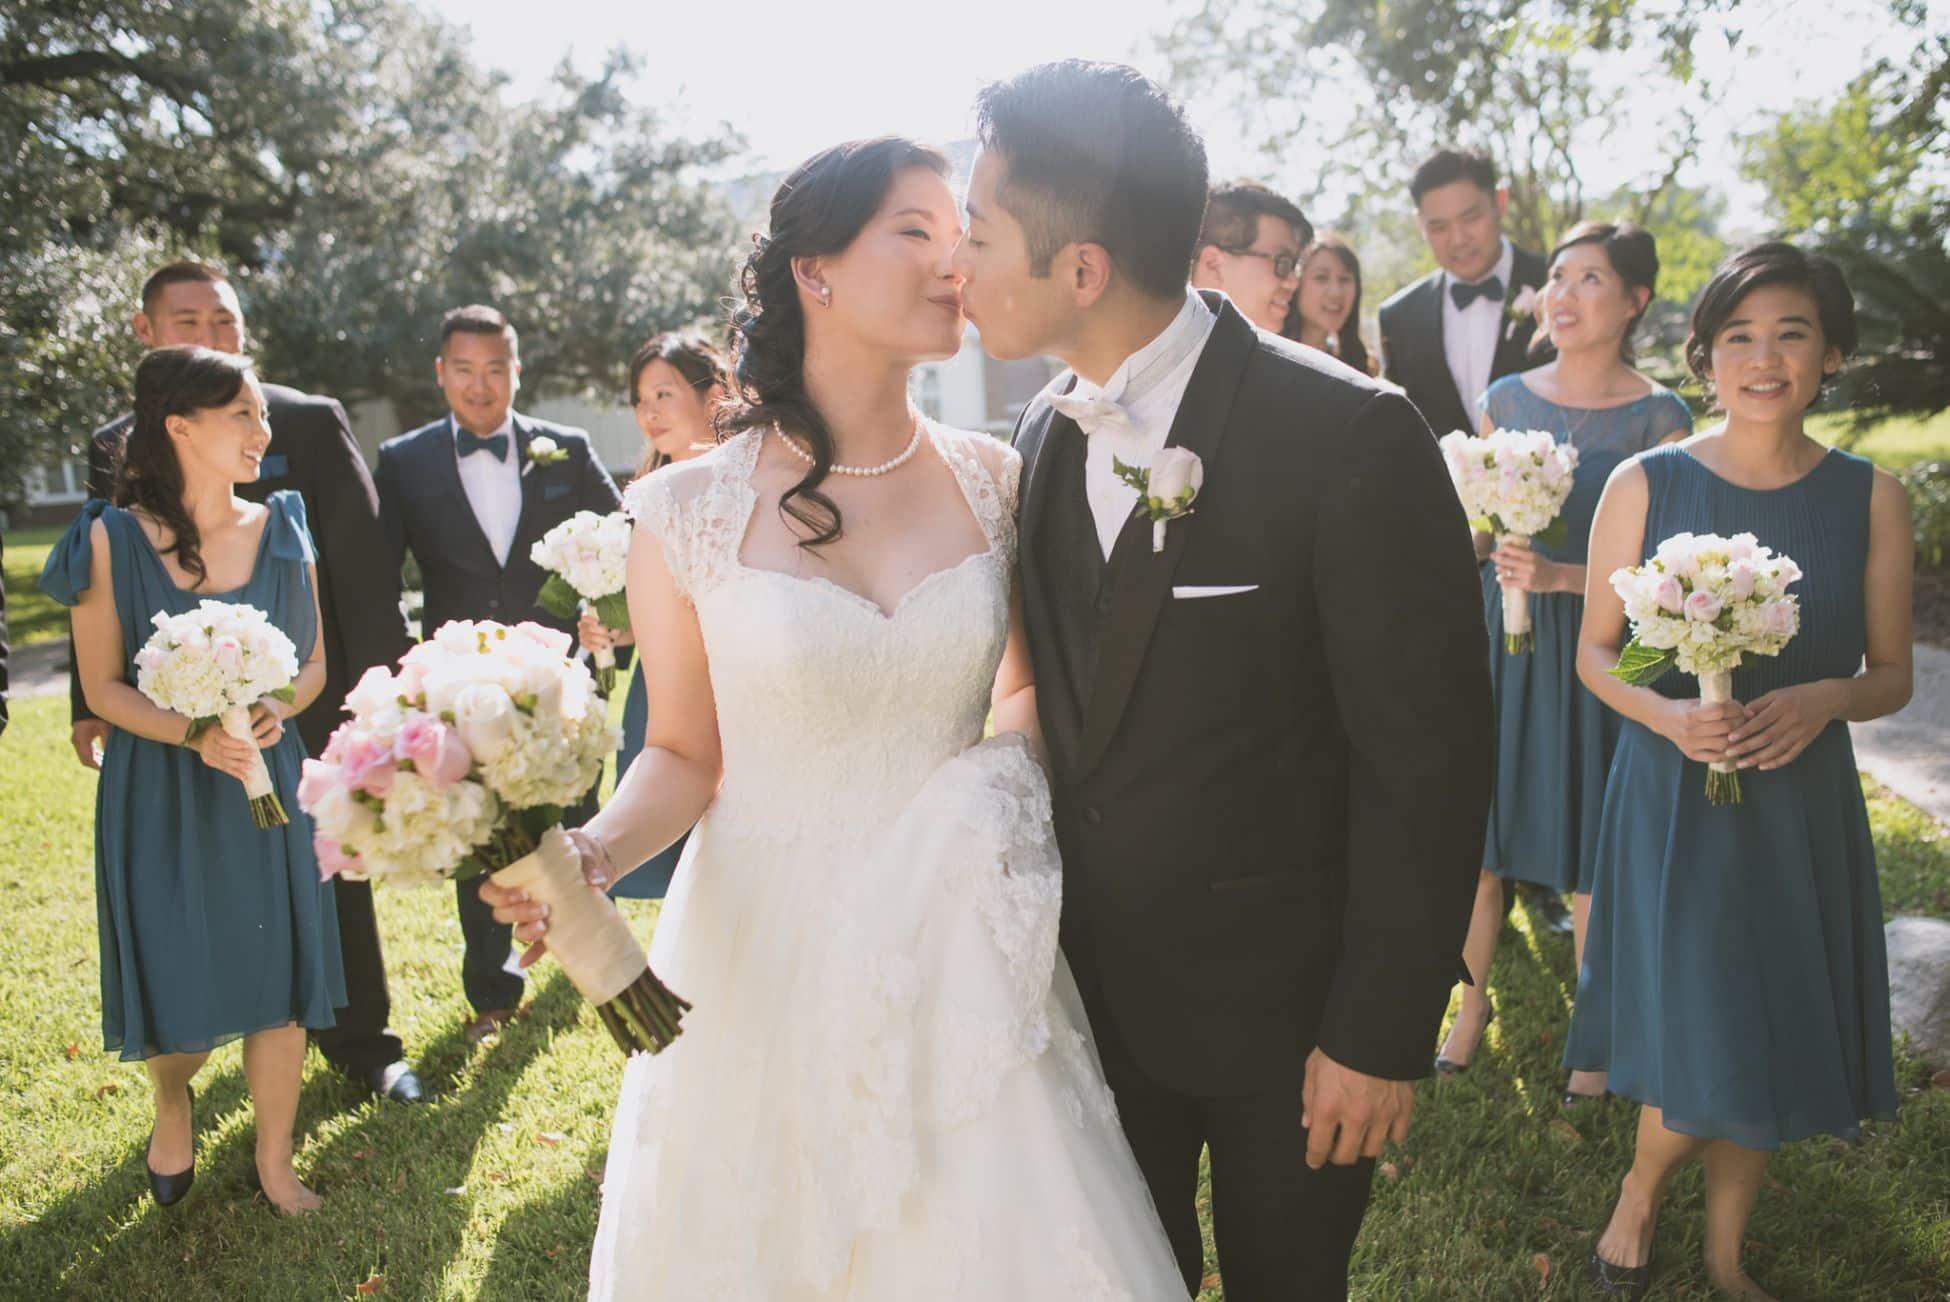 Best 2015 Wedding Photography Austin-11